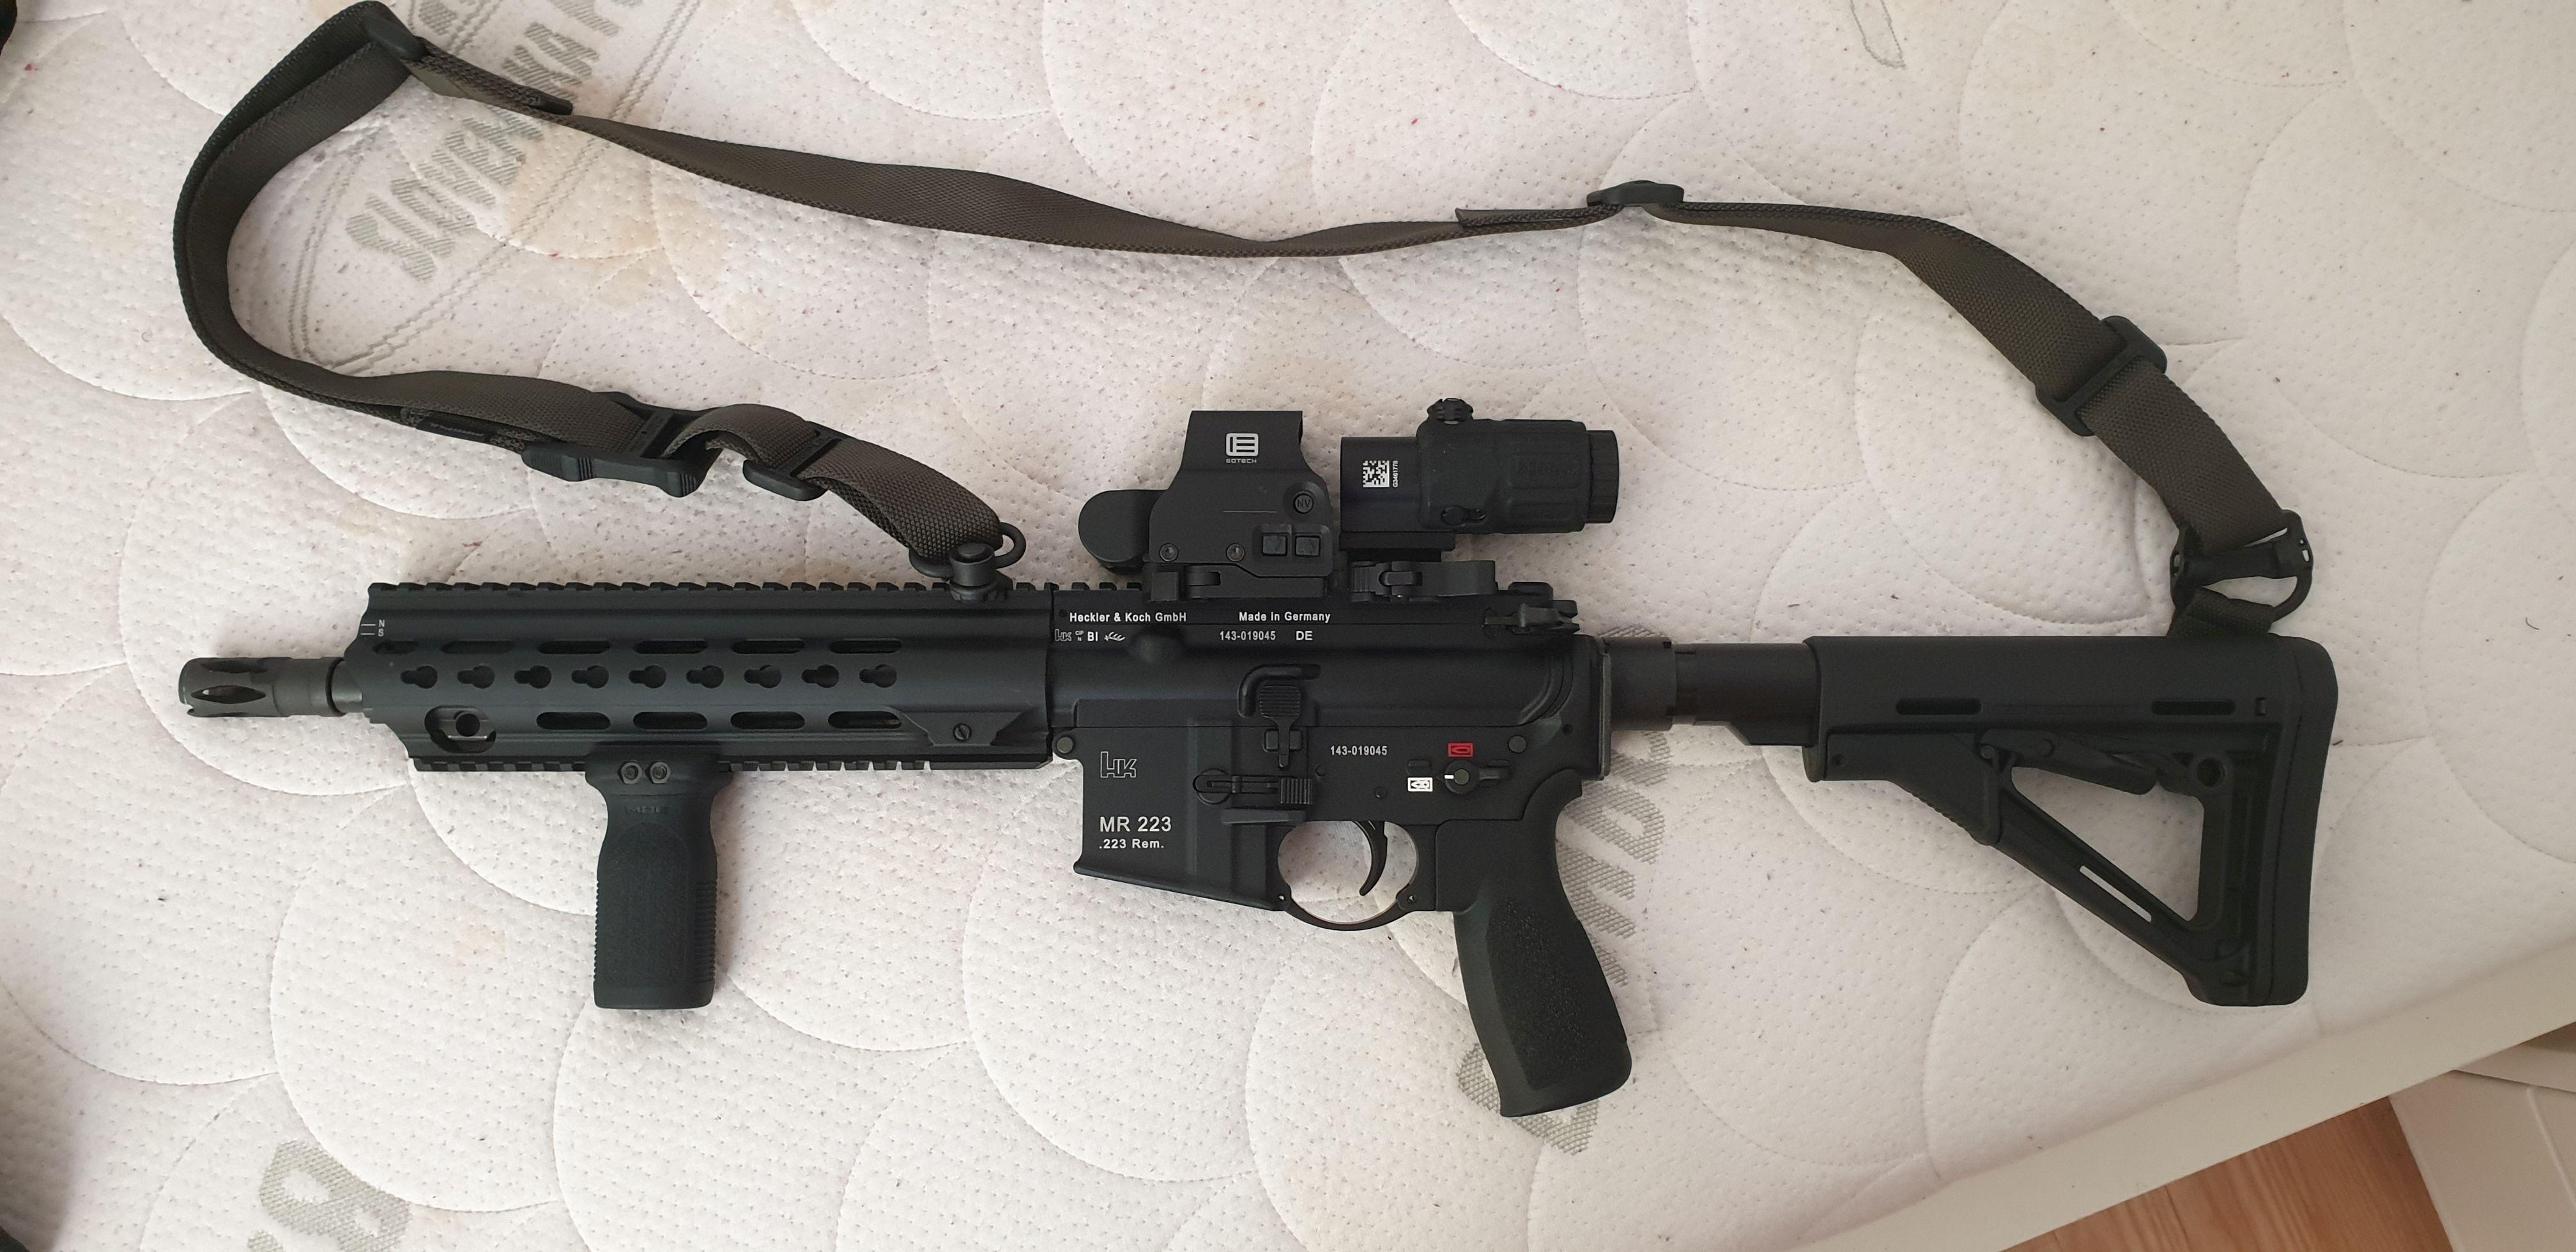 HK MR223 Sling-20190824_150249.jpg